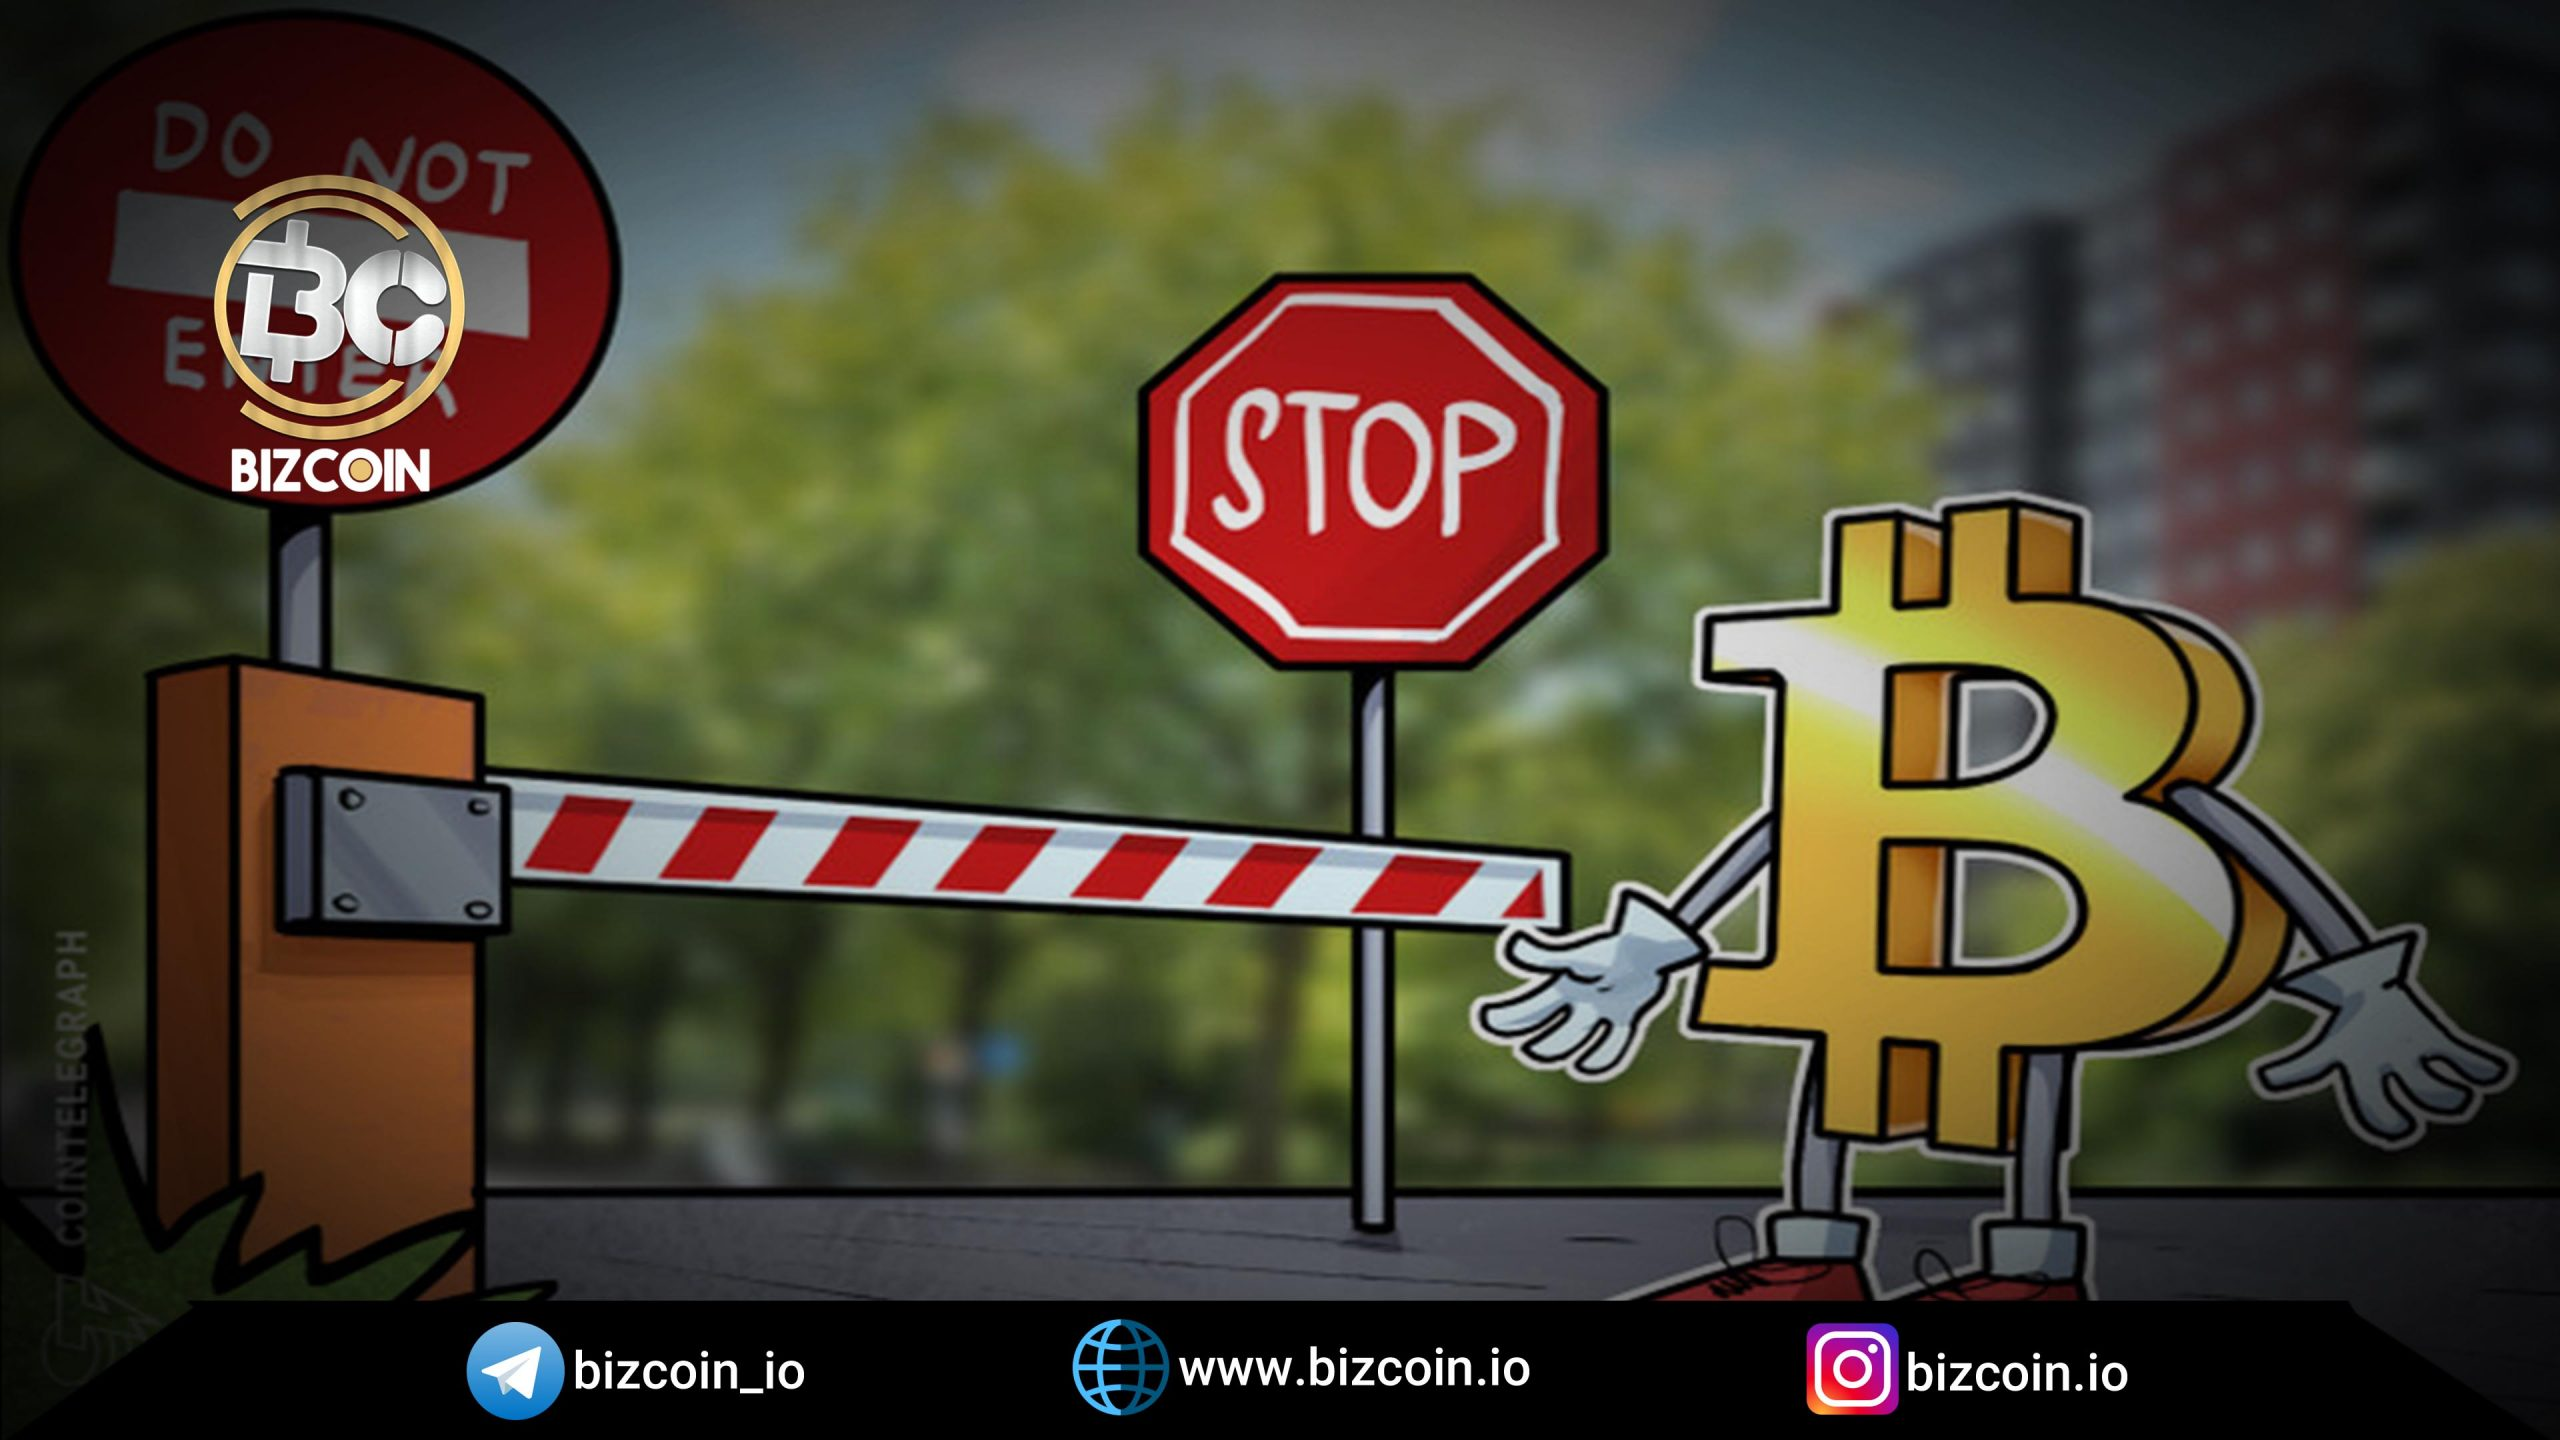 Bitcoin ban scaled آمریکا بیت کوین را نمیتواند ممنوع کند